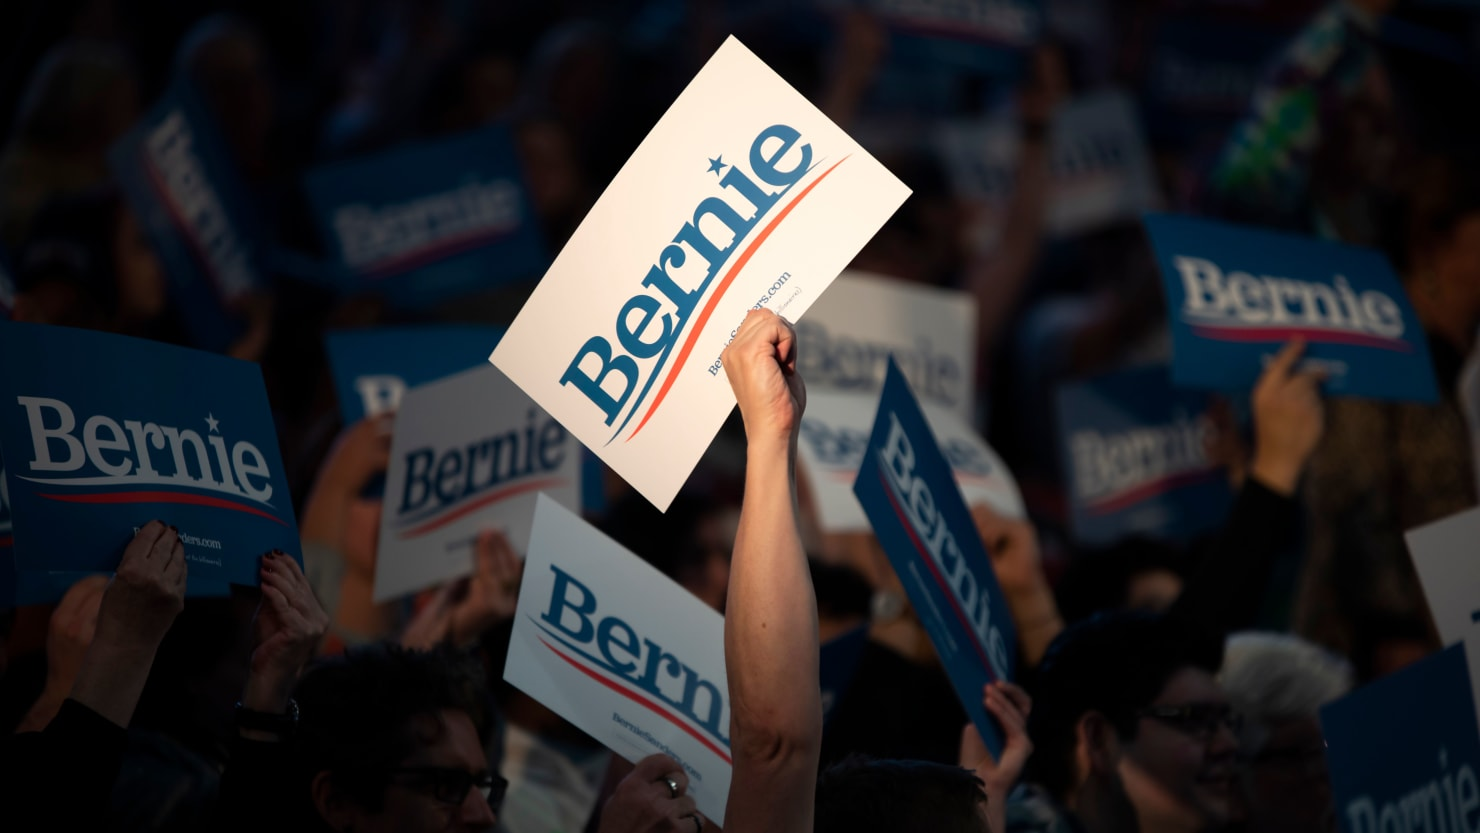 Bernie Sanders Staffer Fired for Mocking Warren, Buttigieg on Private Twitter Account